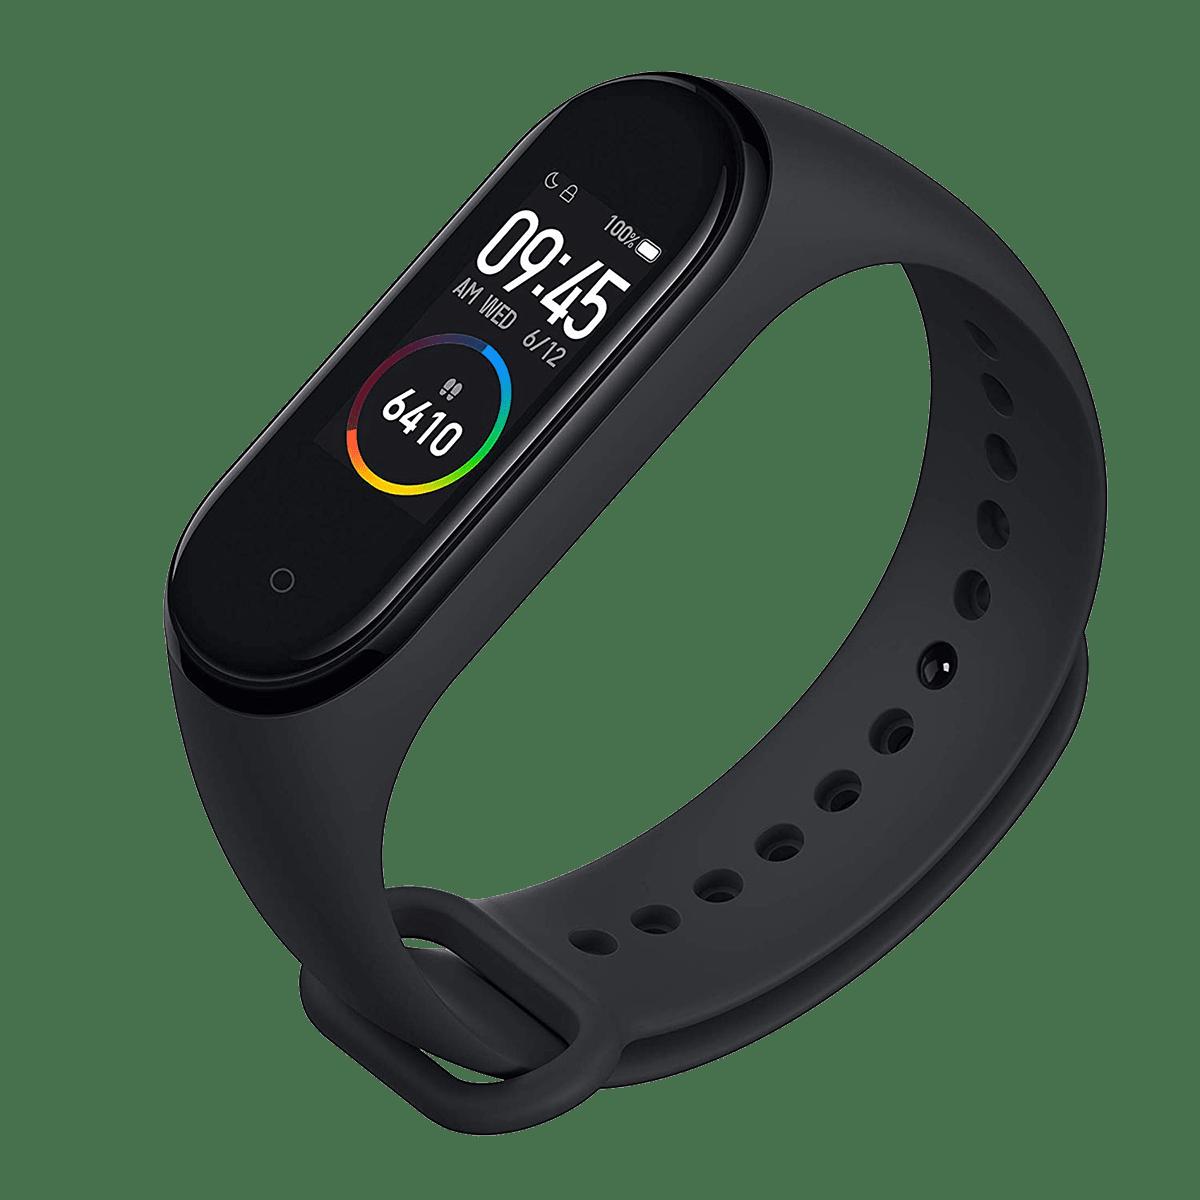 Xiaomi Mi Band 4 Fitness Tracker (24.1mm) (Heart Rate Sensor, MGW4054IN, Black, TPU Band)